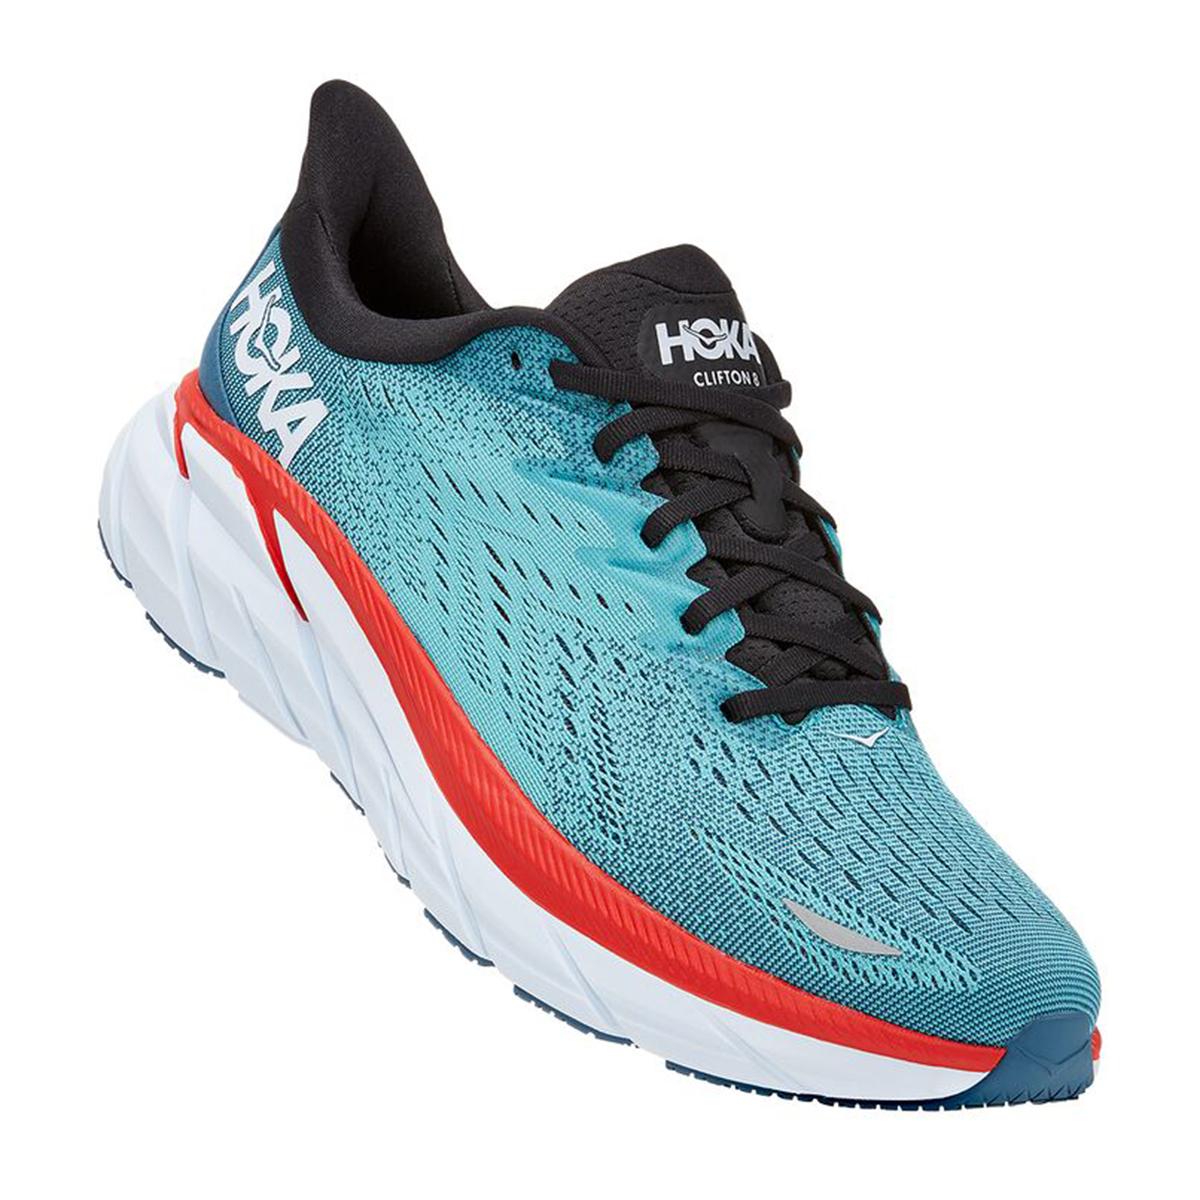 Men's Hoka One One Clifton 8 Running Shoe - Color: Real Teal/Aquarelle - Size: 7 - Width: Regular, Real Teal/Aquarelle, large, image 5